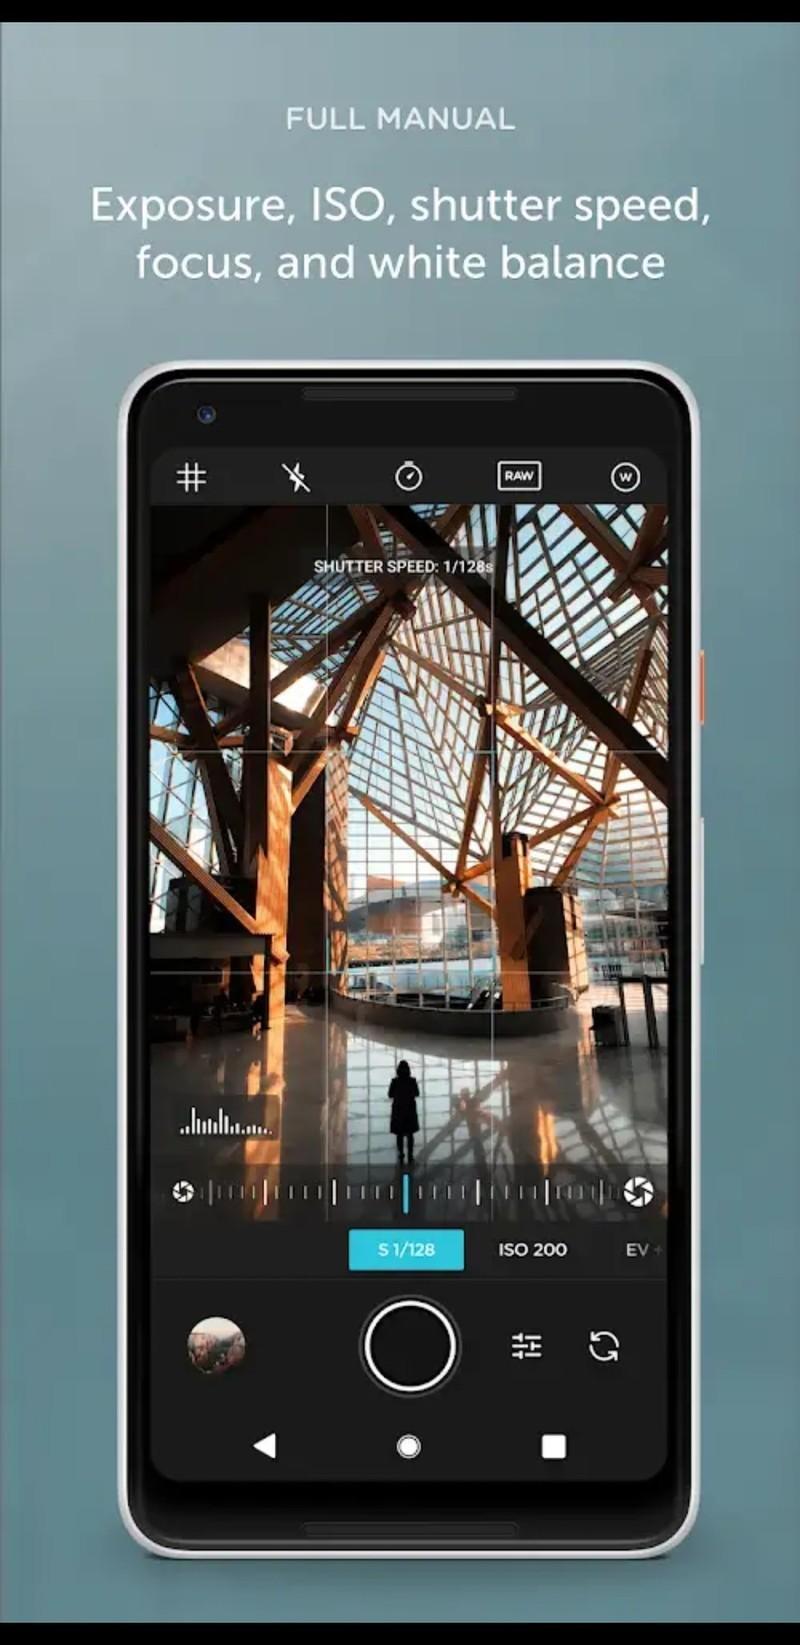 moment-pro-camera-app-1.jpg?itok=iUNVJ1l